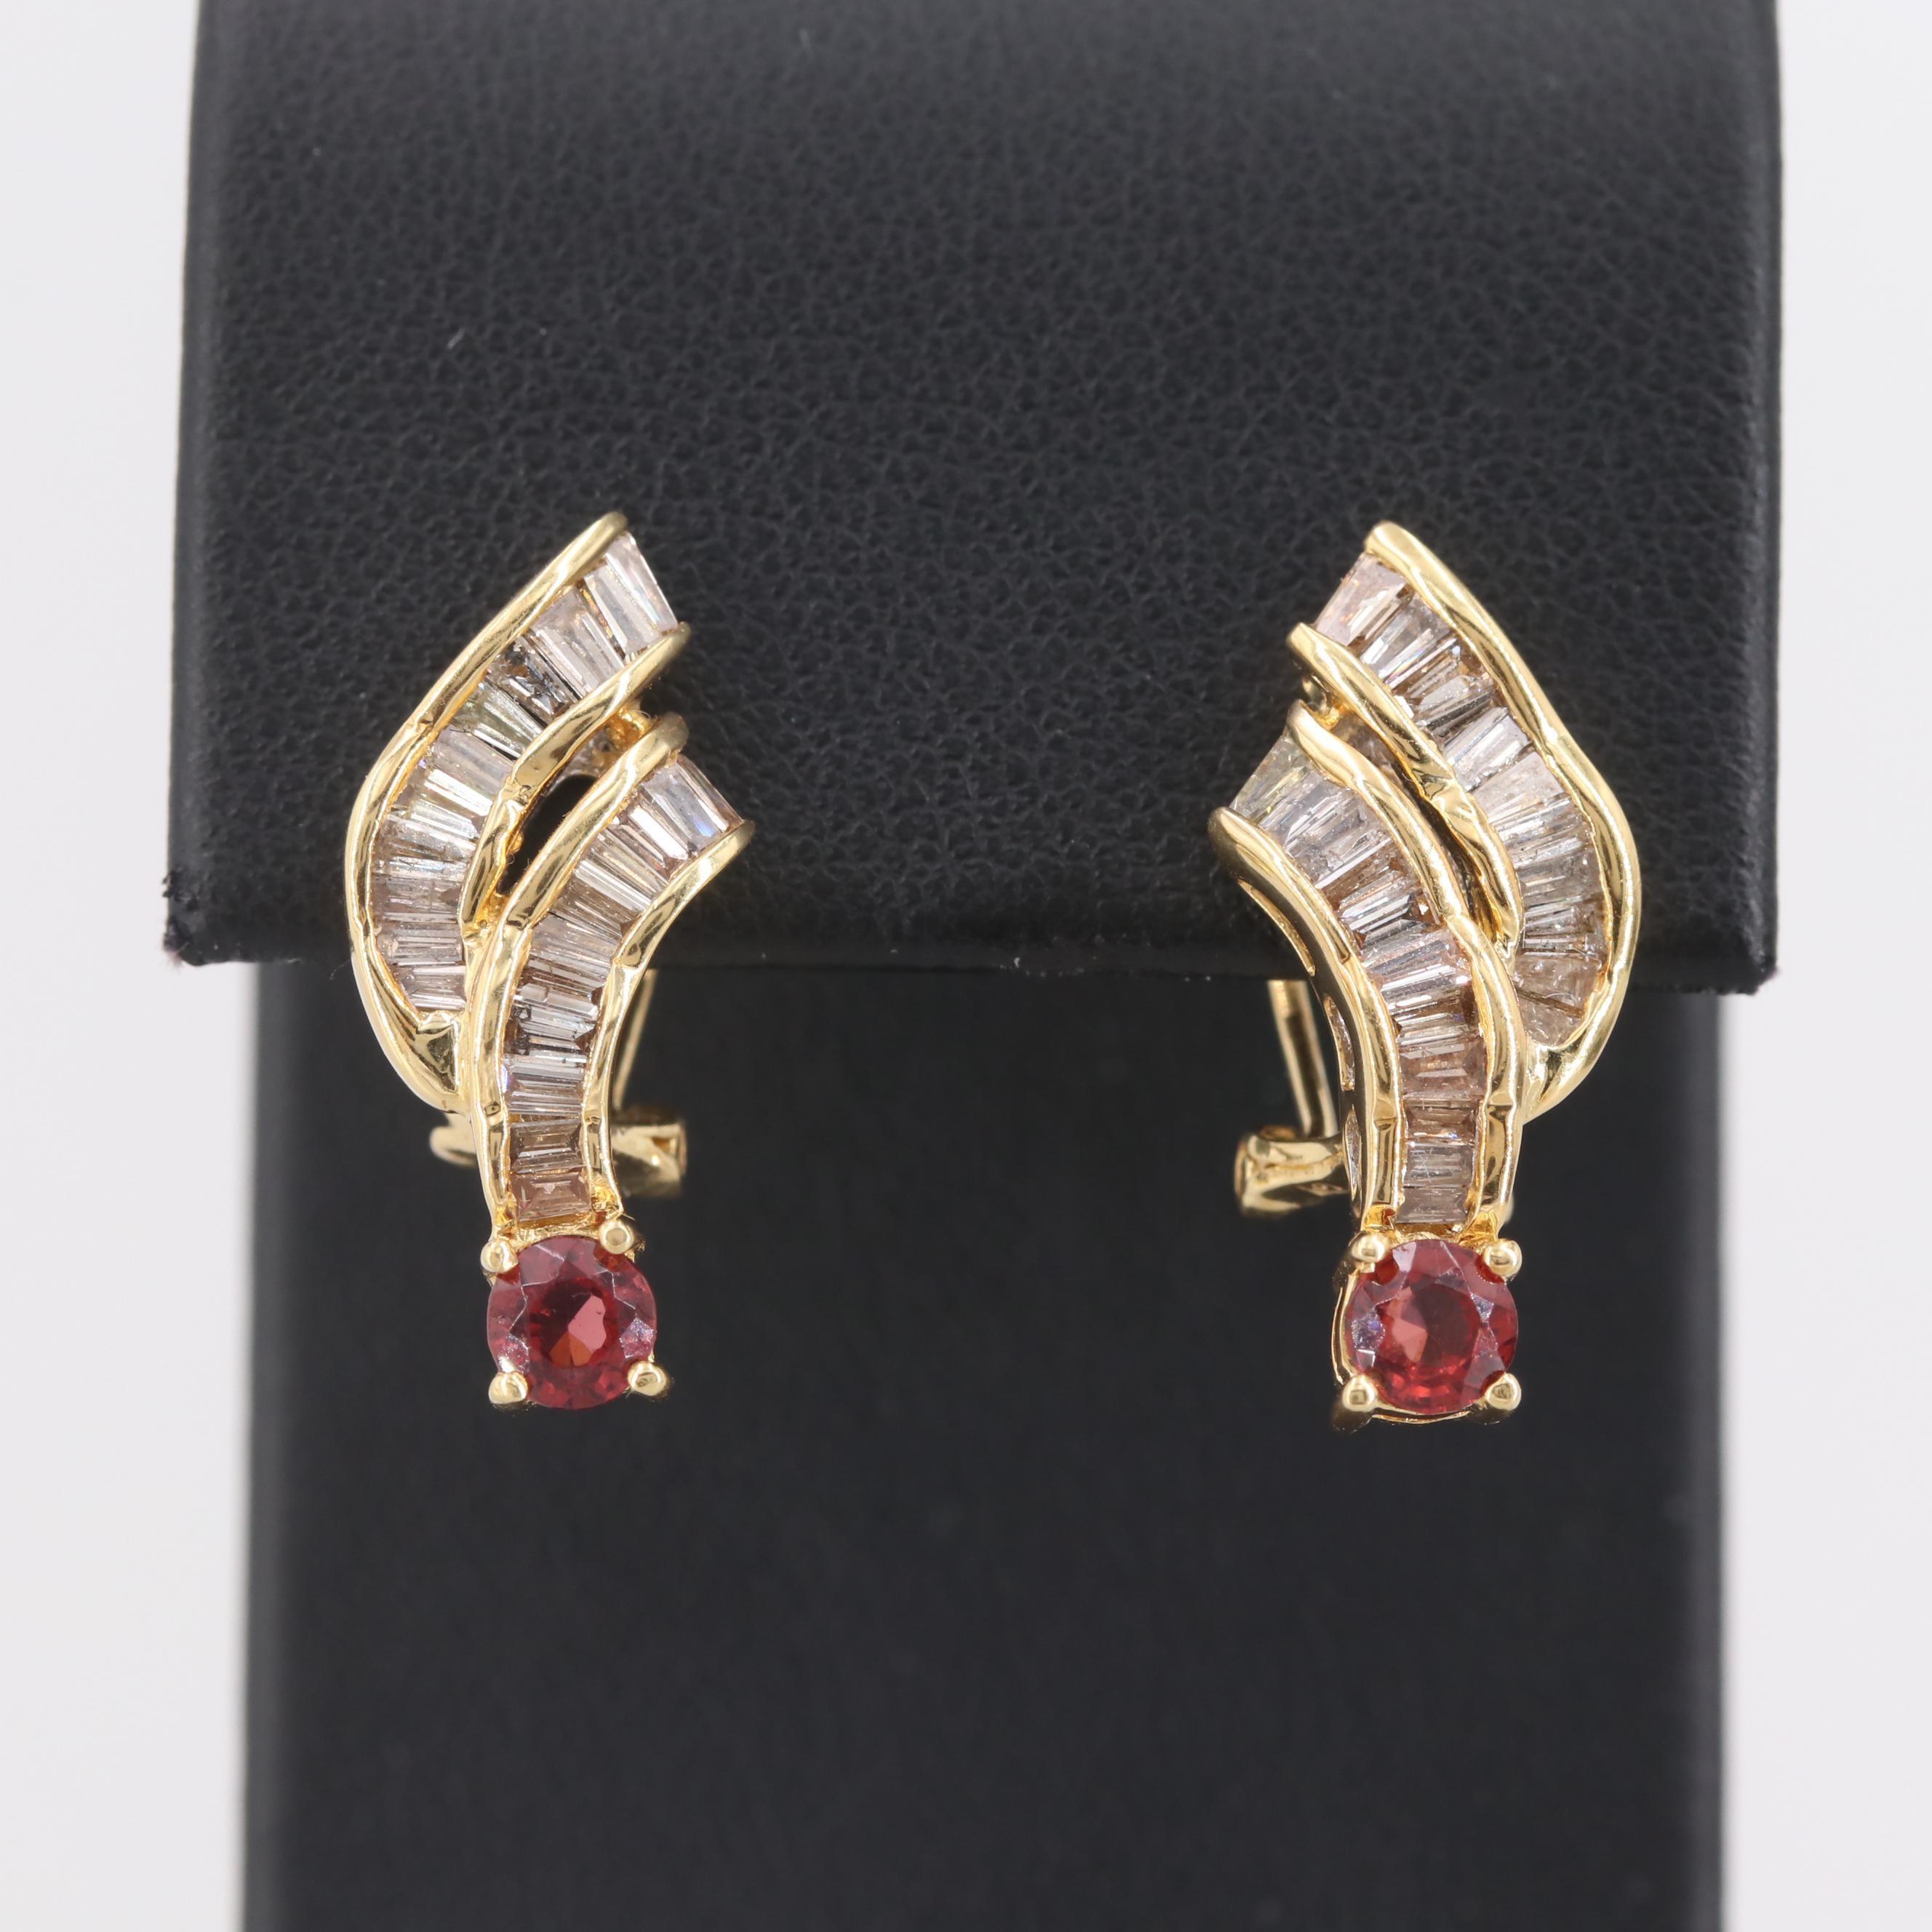 18K Yellow Gold Garnet and Diamond Earrings